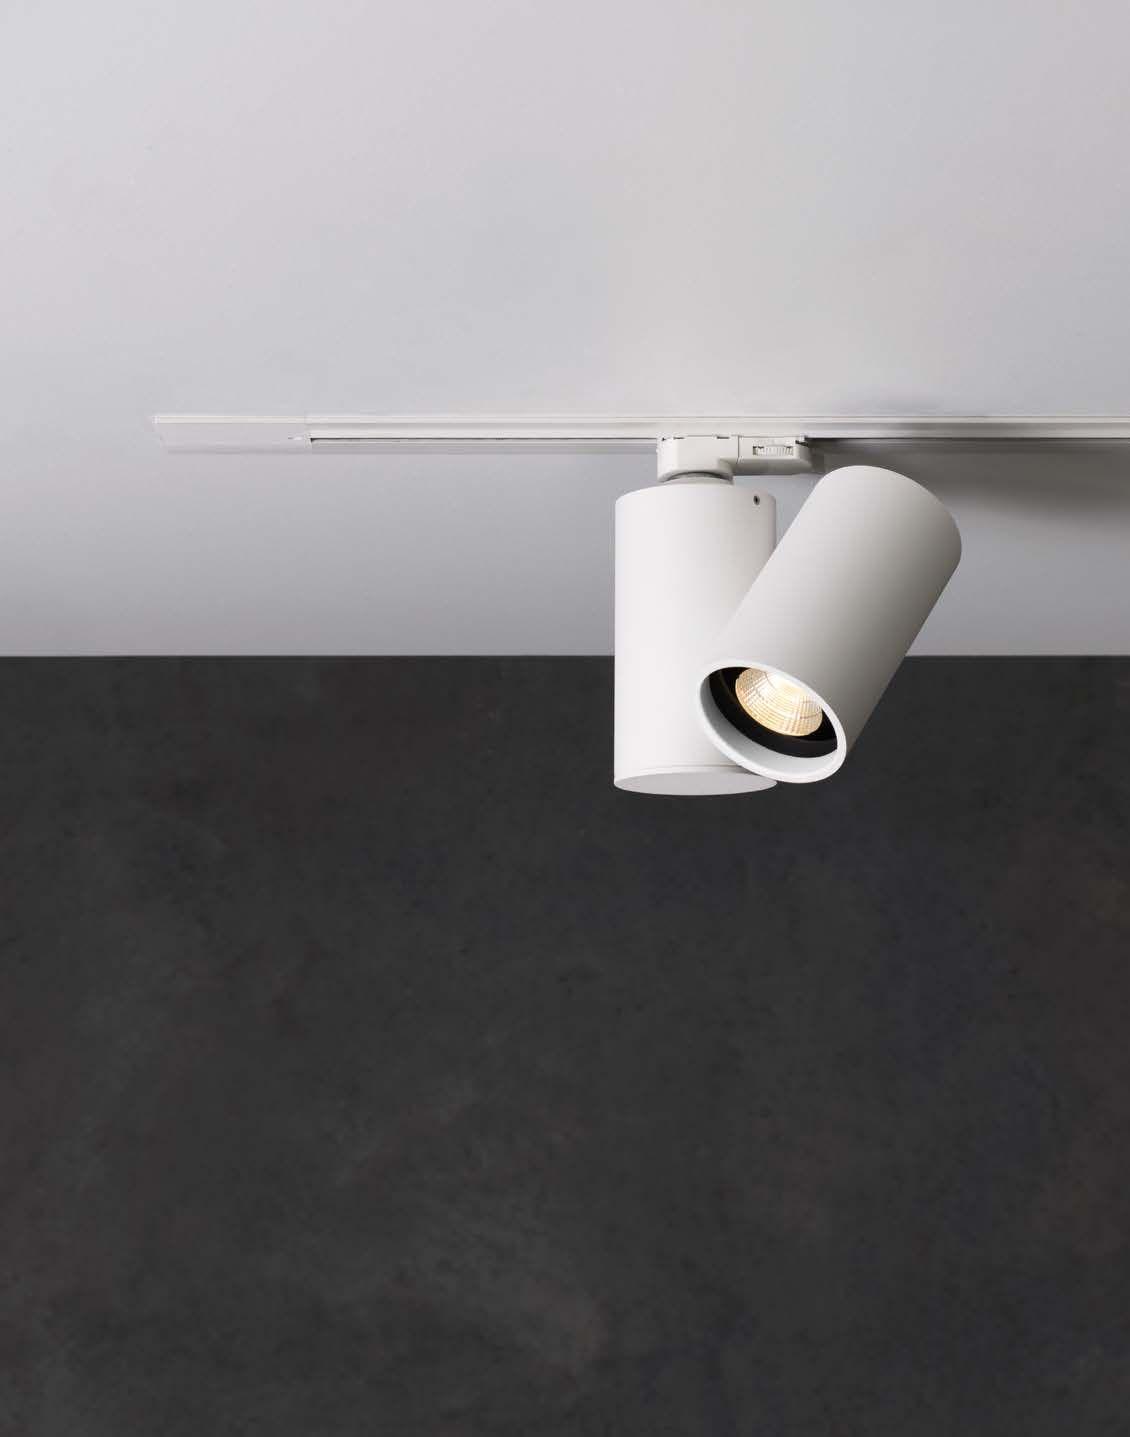 Horizon Track Light: Compact & Subtle for Multiple